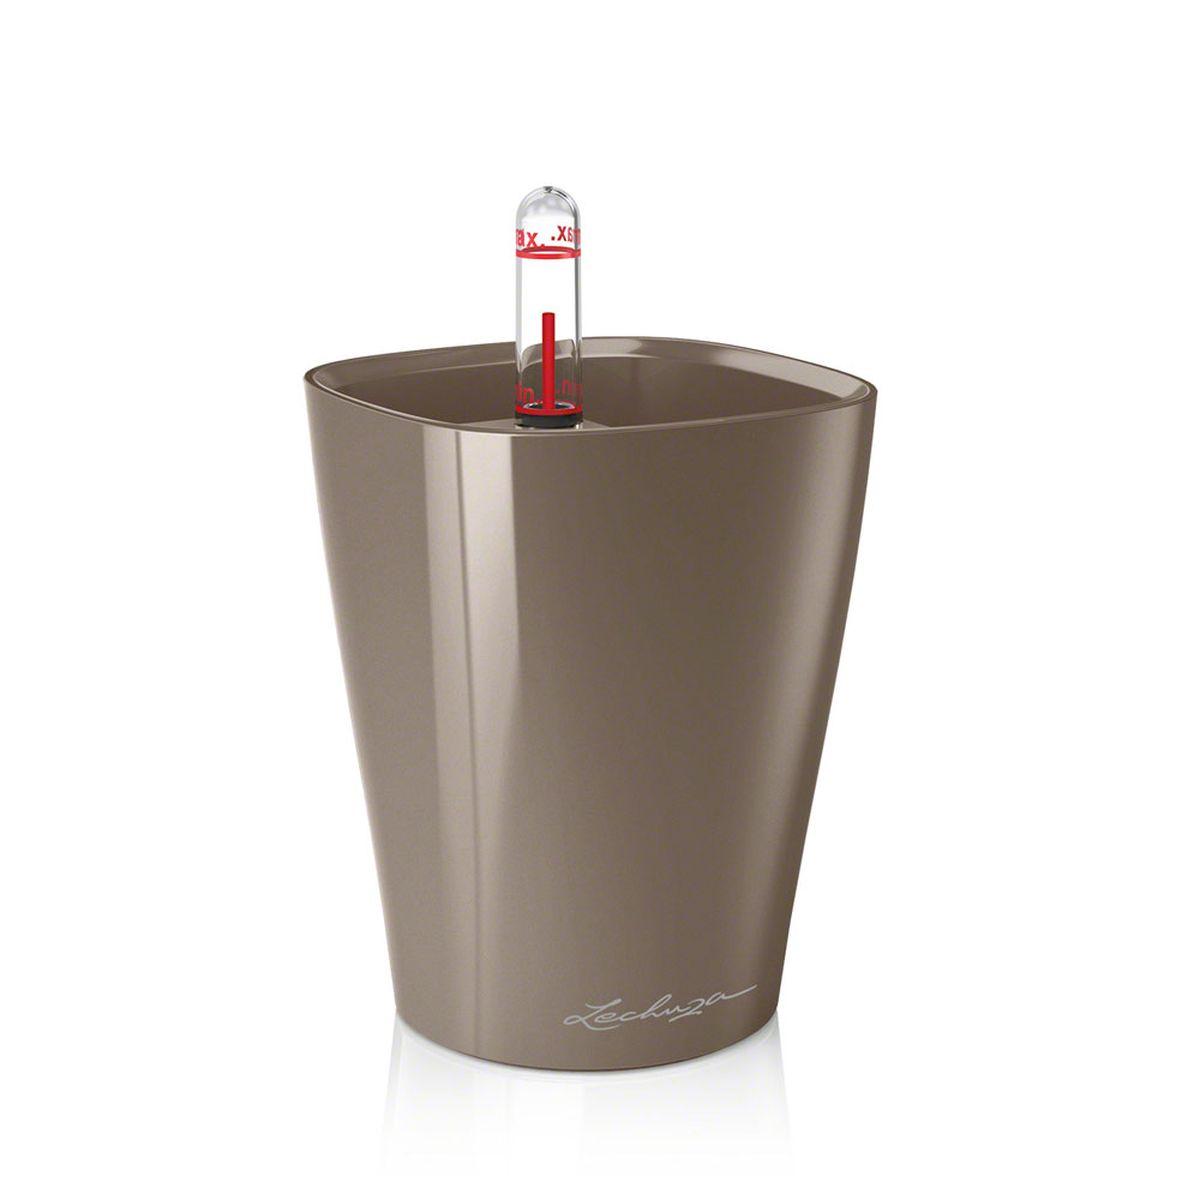 "Кашпо Lechuza ""Mini Deltini"", с системой автополива, цвет: серо-коричневый, 10 х 10 х 13 см 14959"